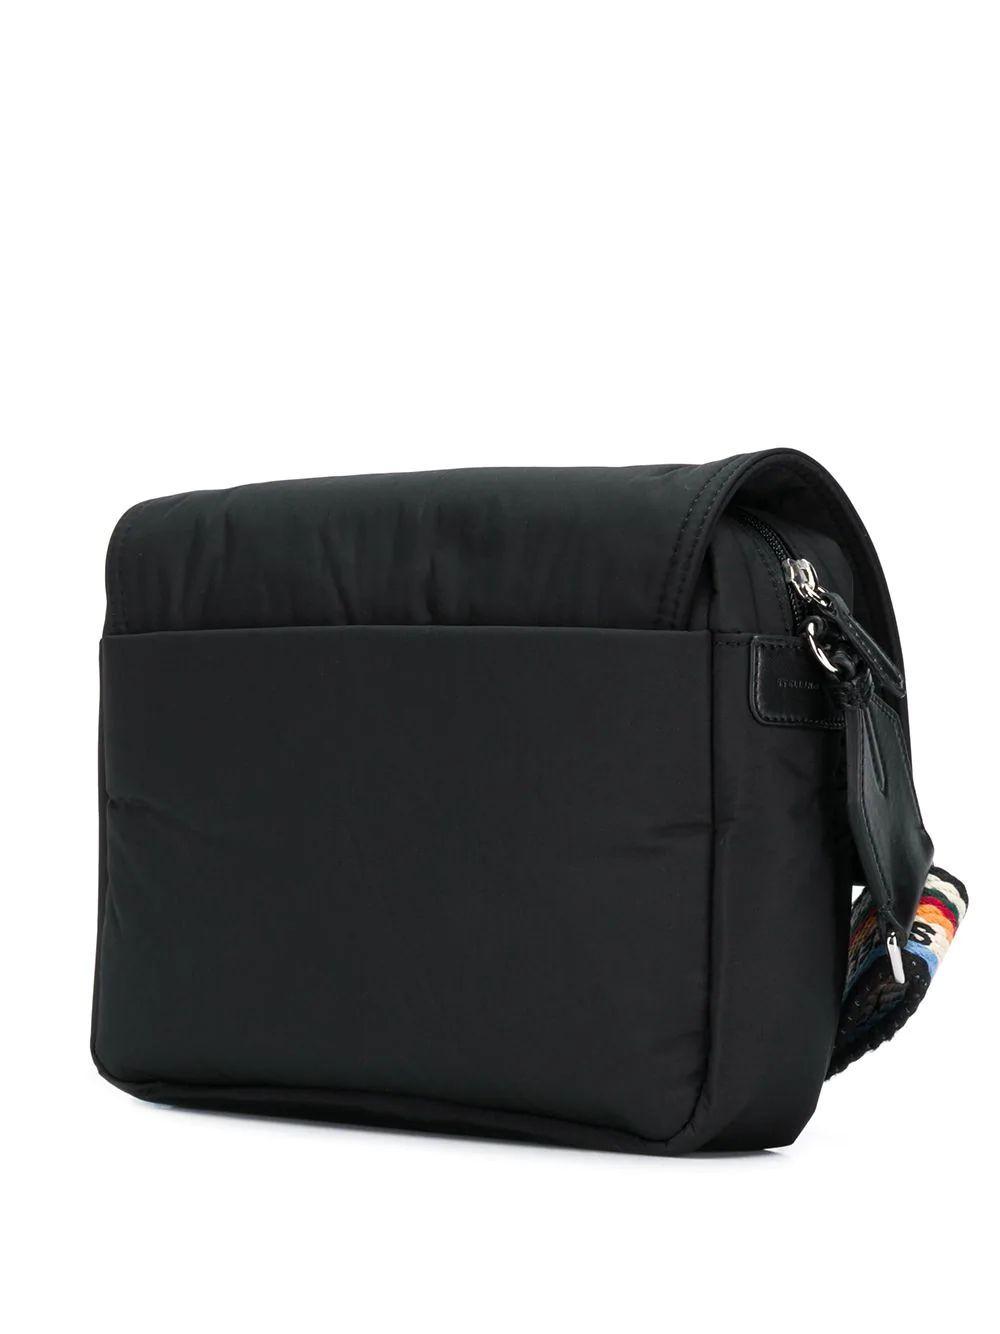 STELLA MCCARTNEY WOMEN'S 594250W85801000 BLACK SYNTHETIC FIBERS SHOULDER BAG